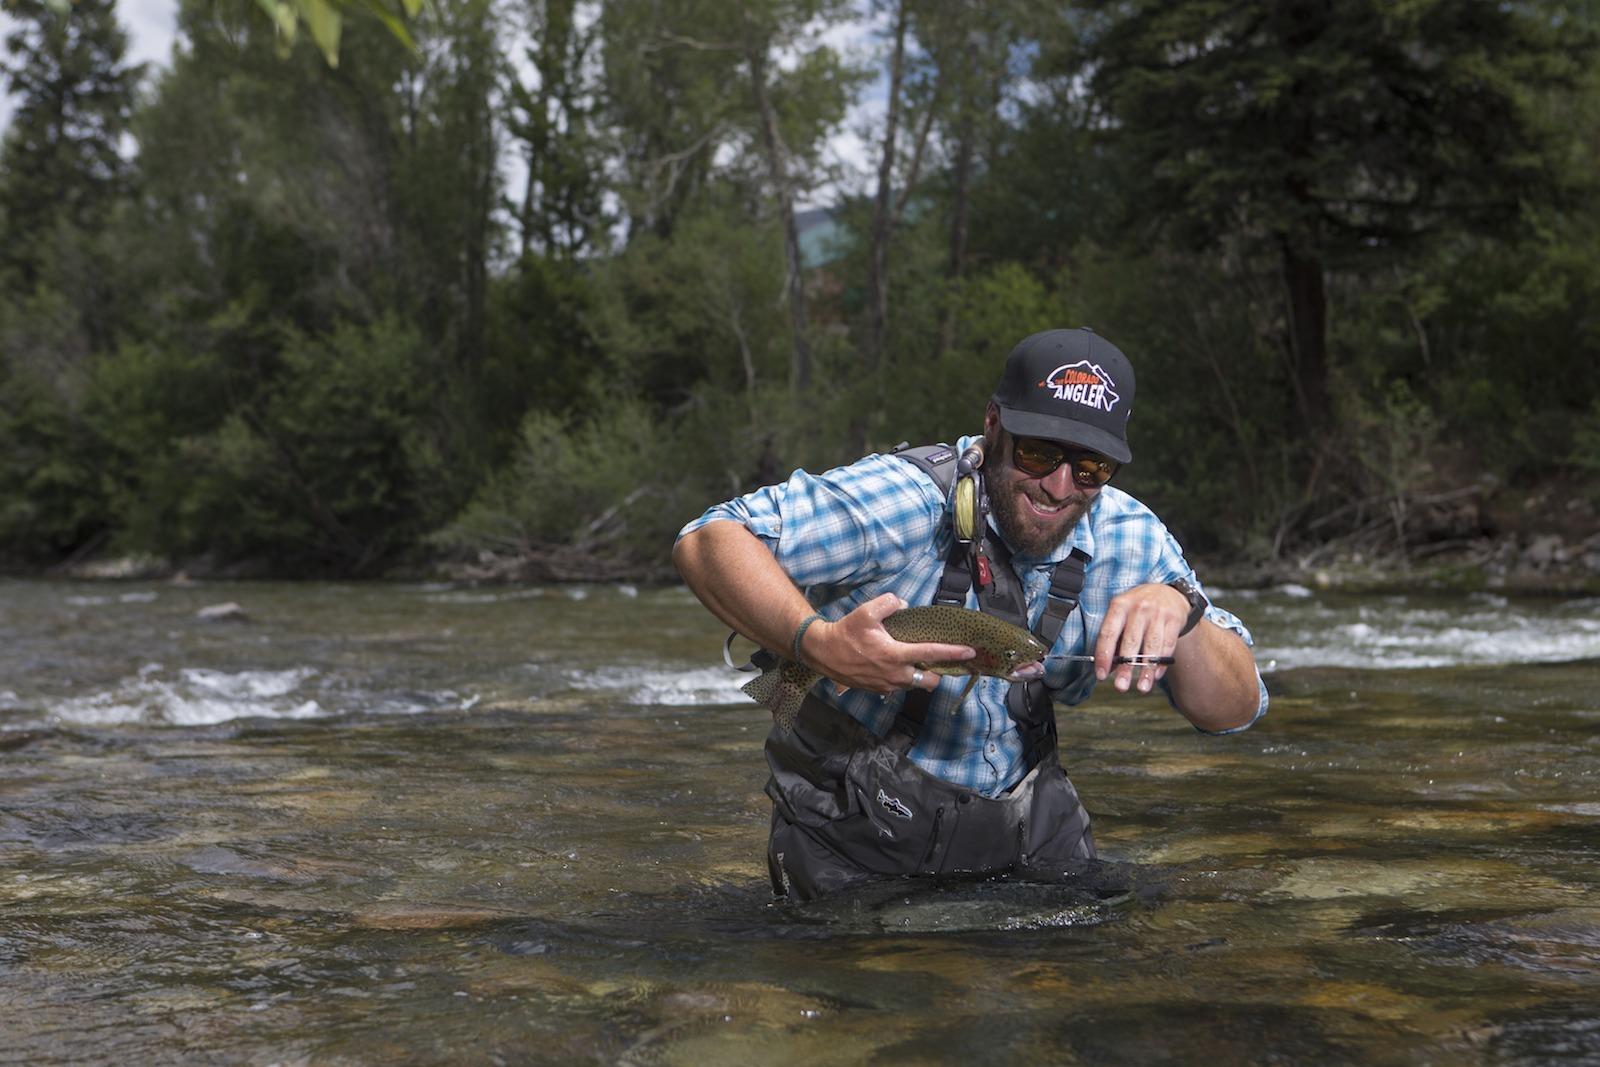 Fishing in Silverthorne of high Colorado region